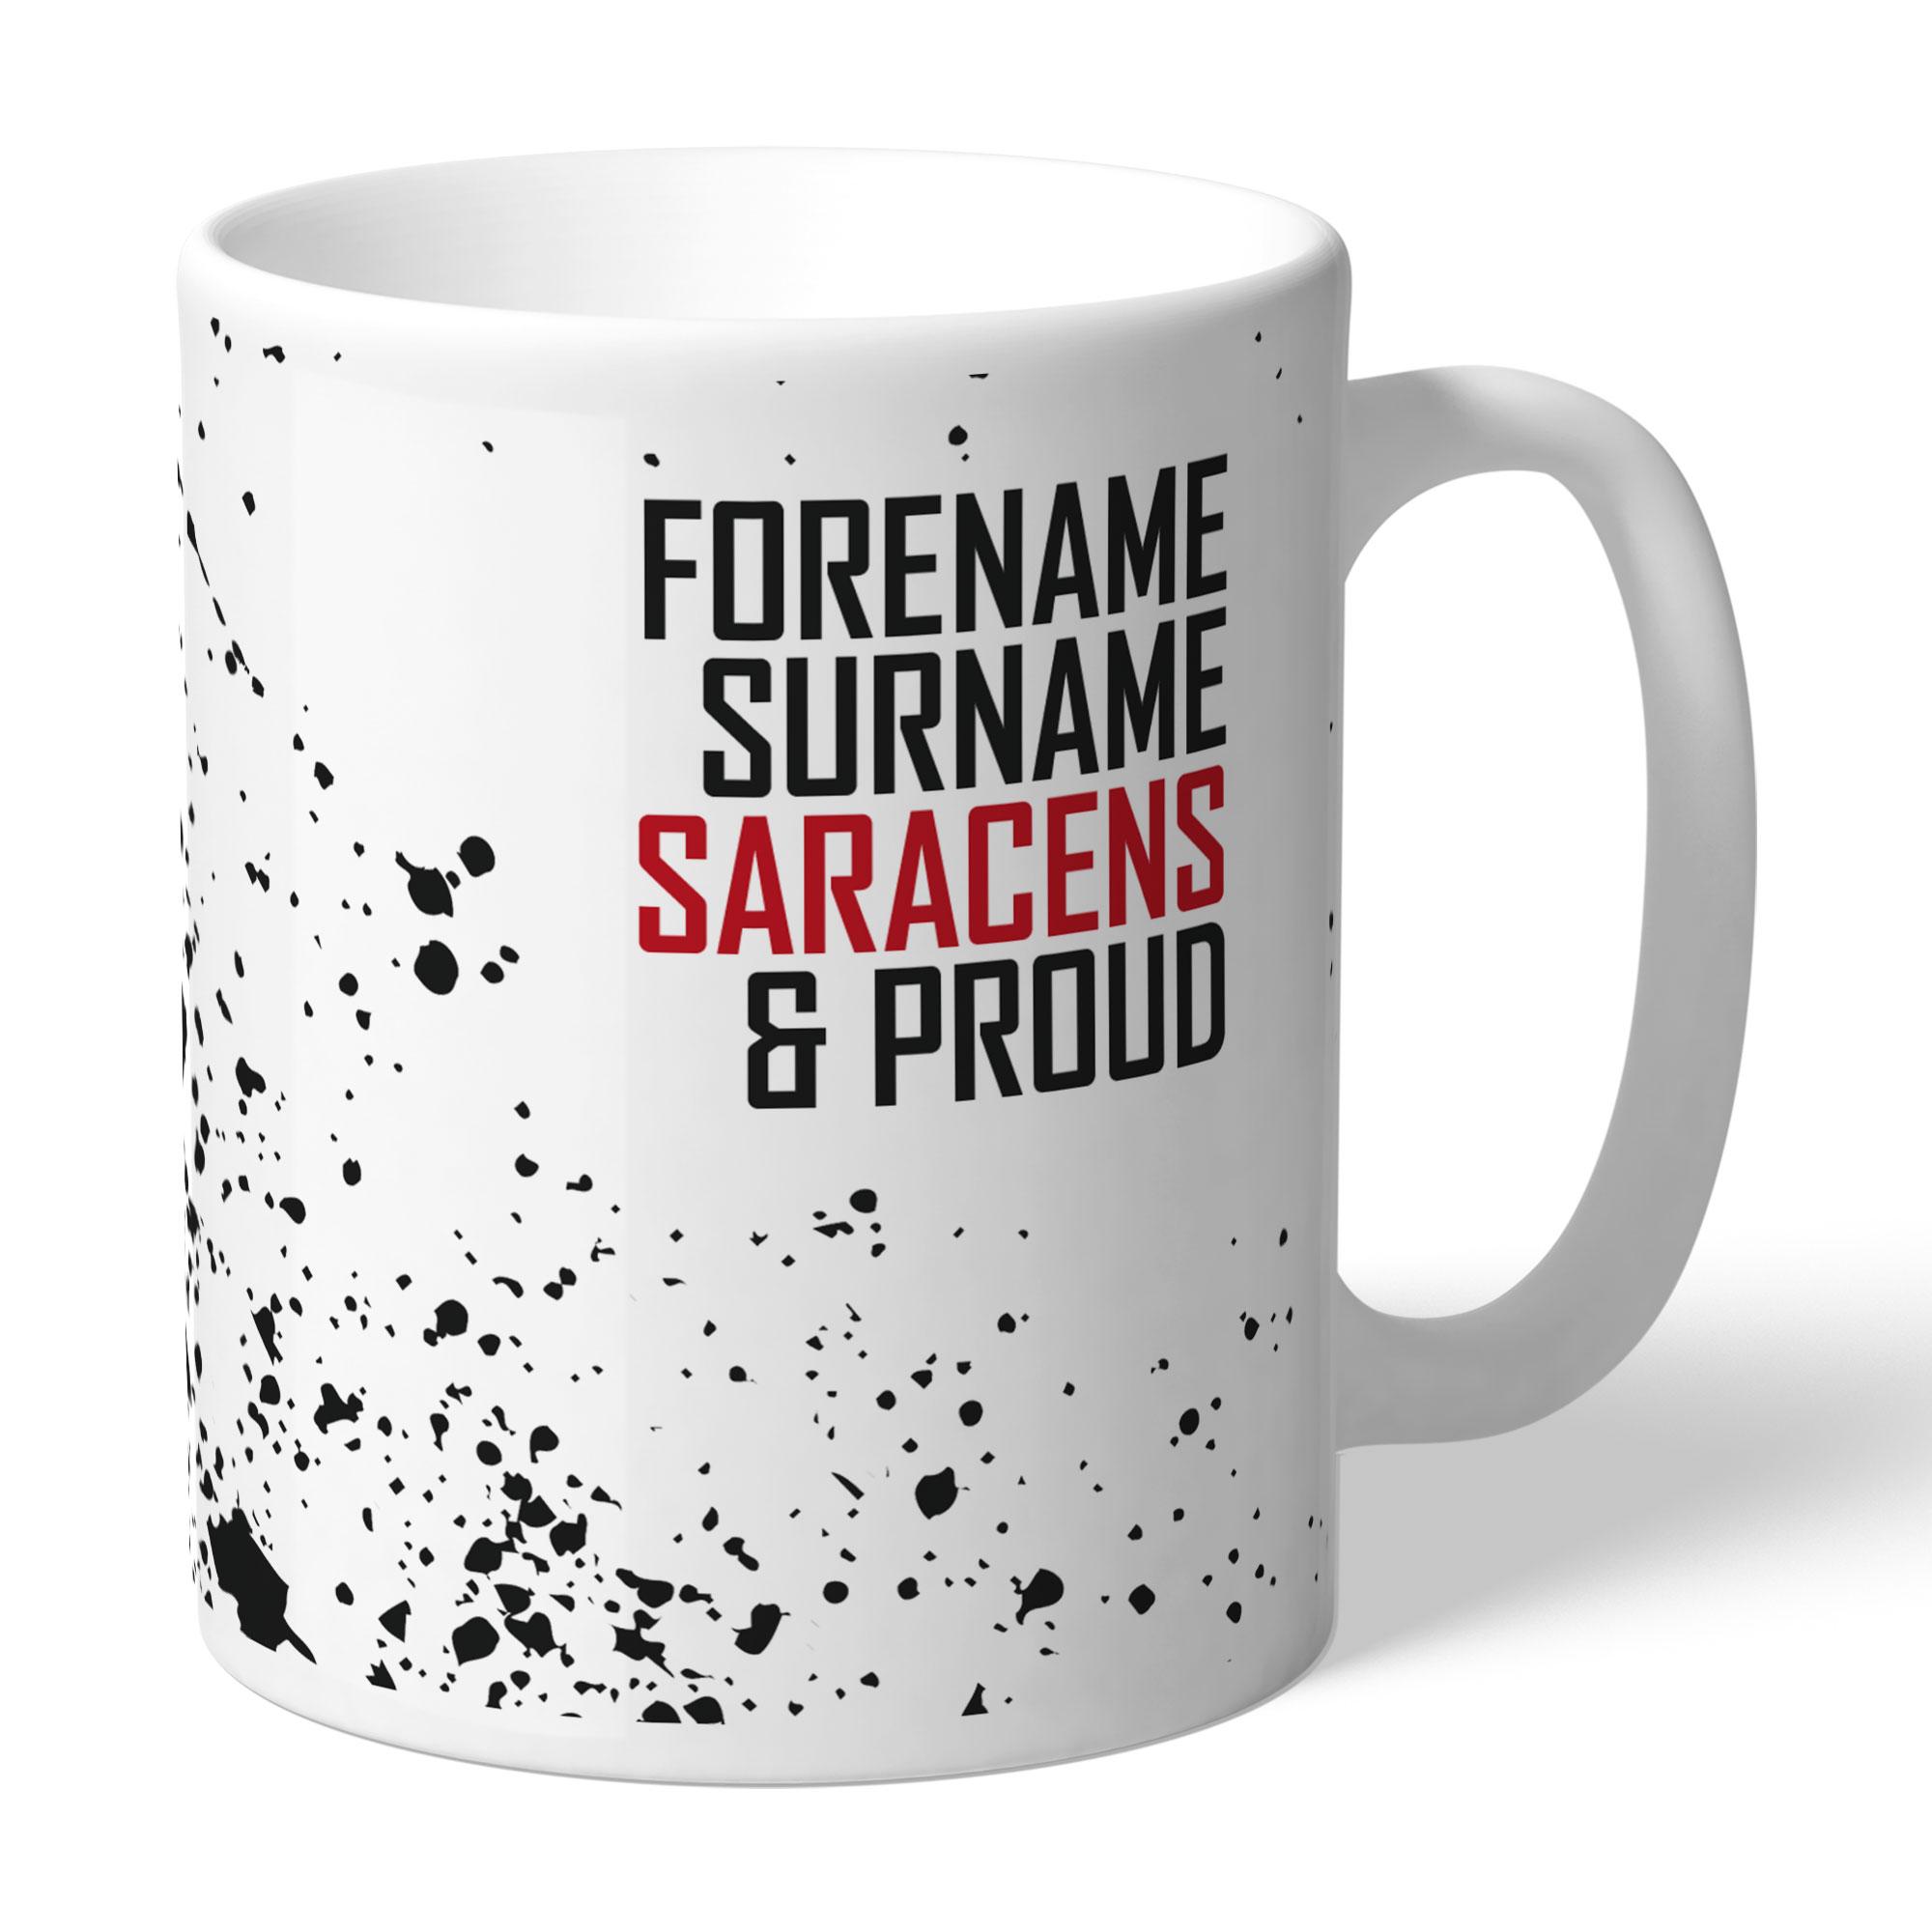 Saracens Proud Mug